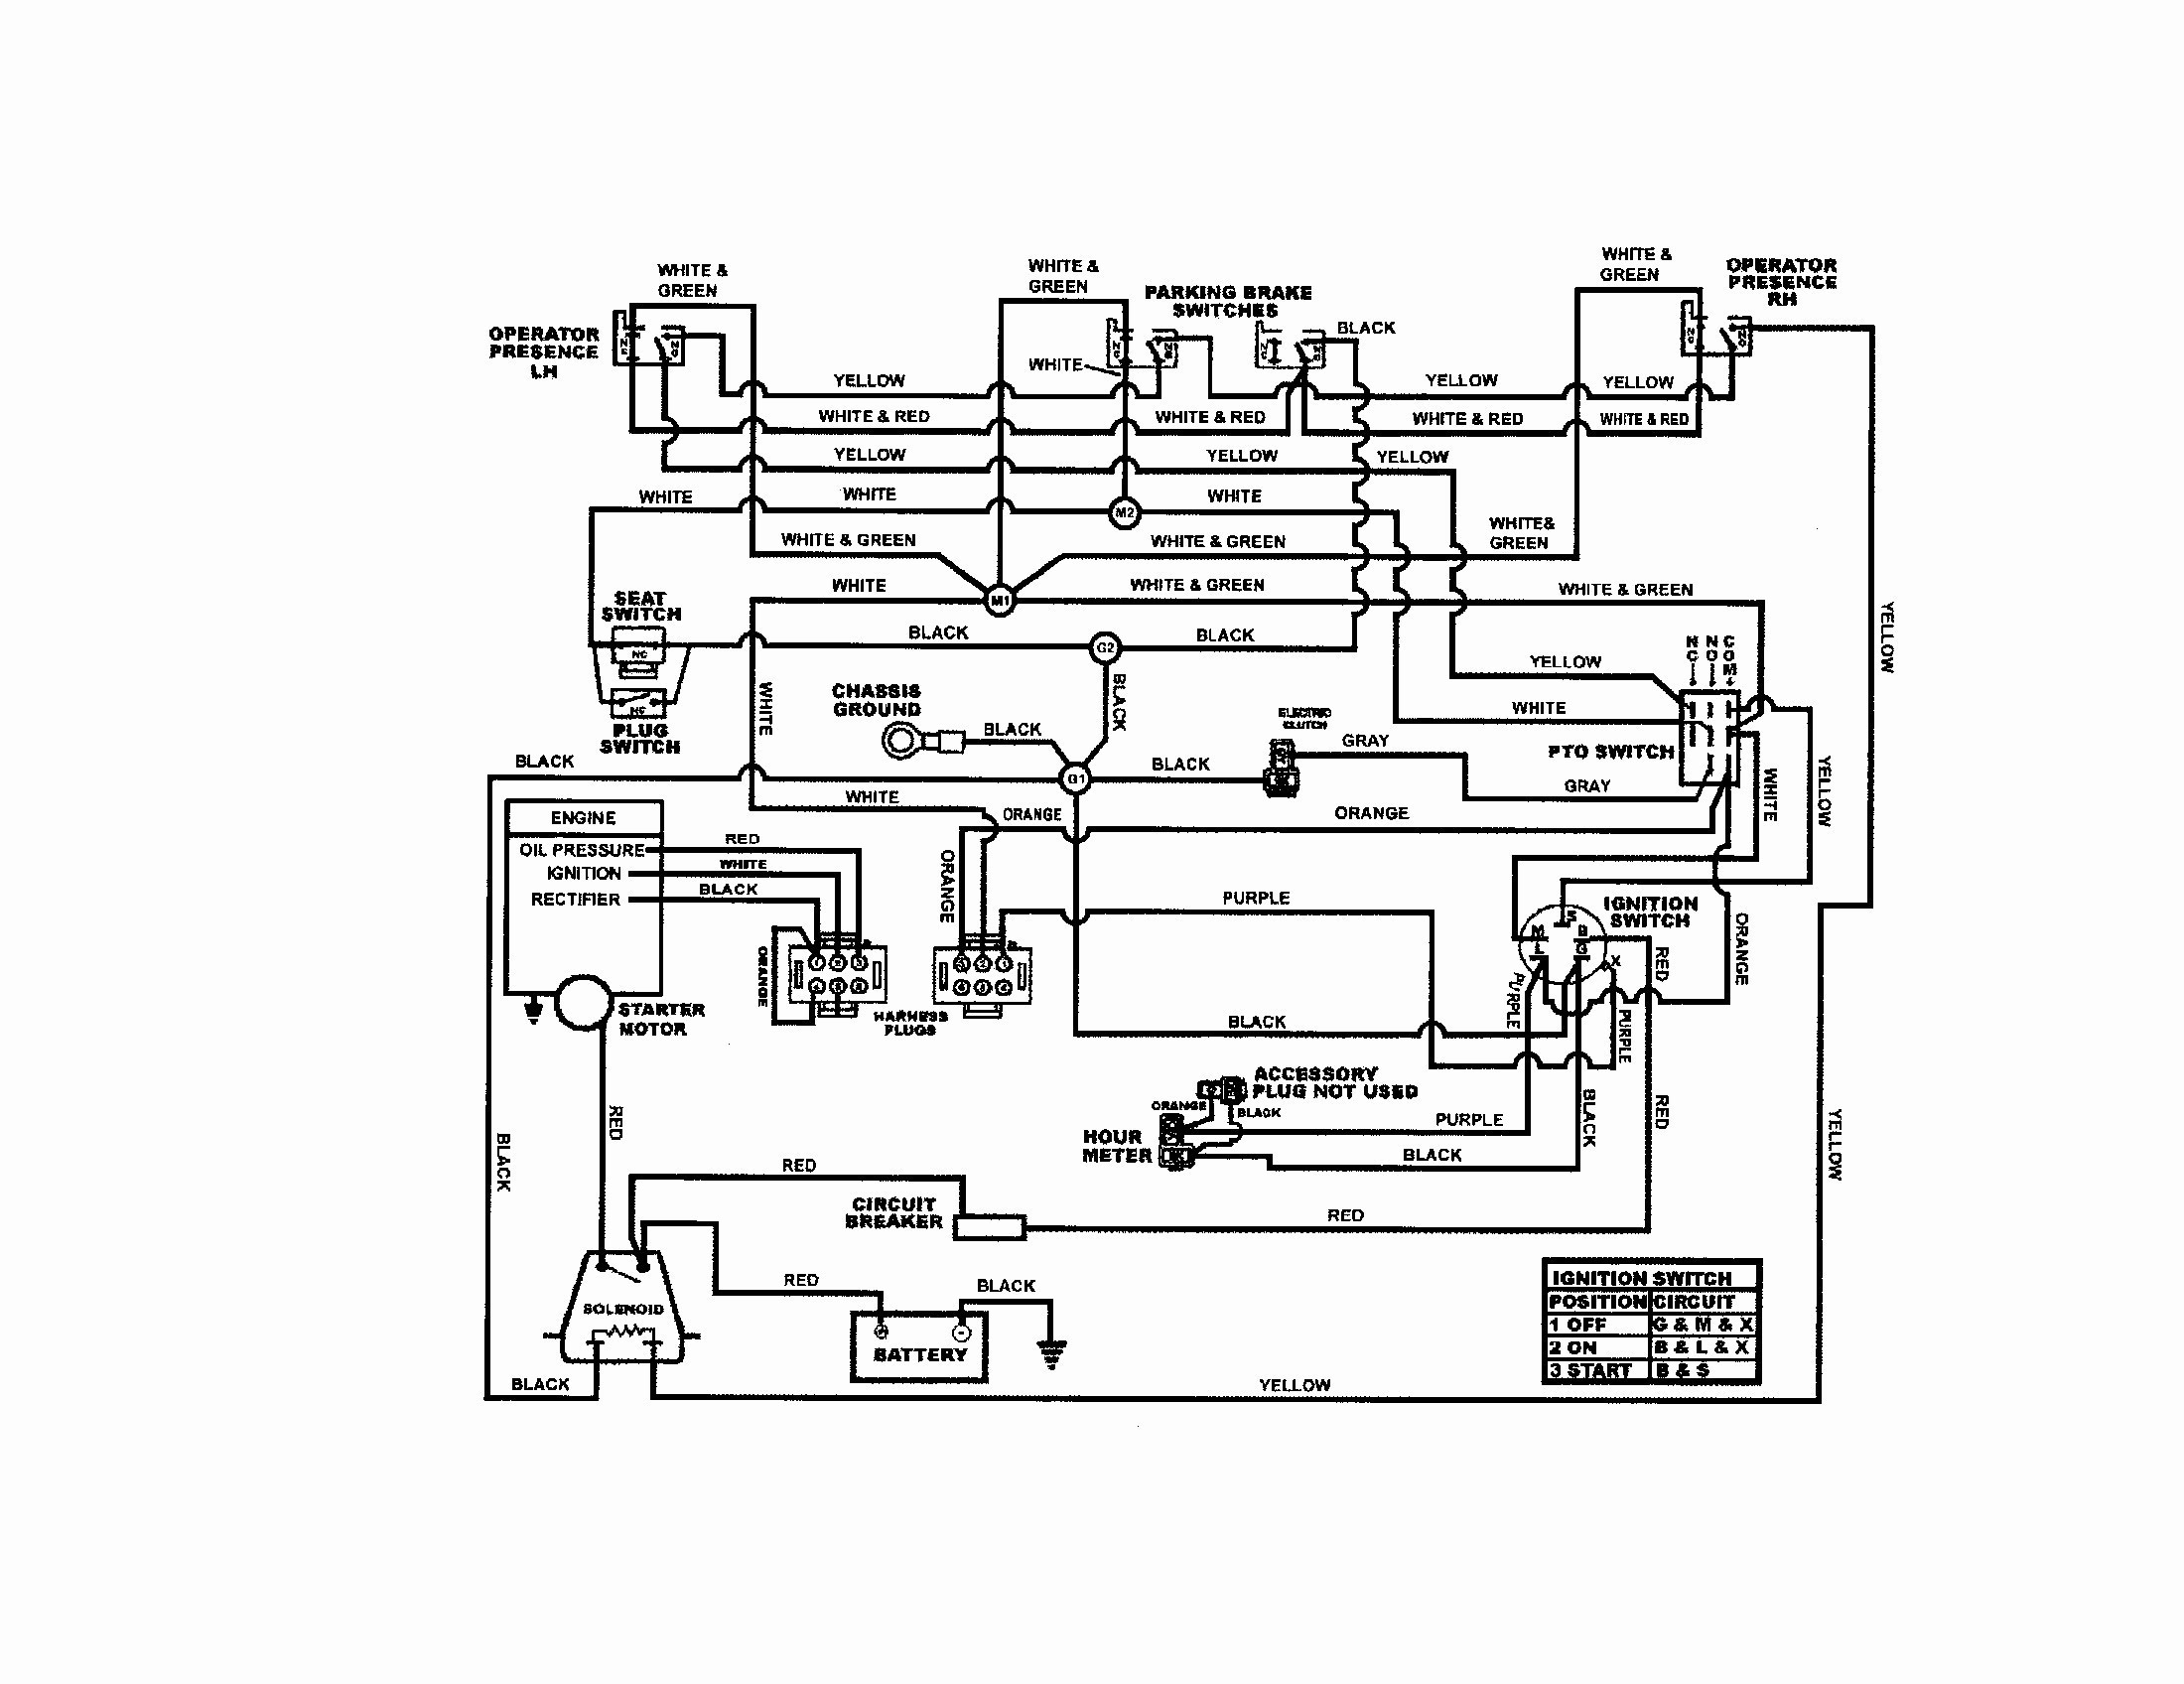 Kohler Ignition Switch Wiring Diagram | Wiring Diagram